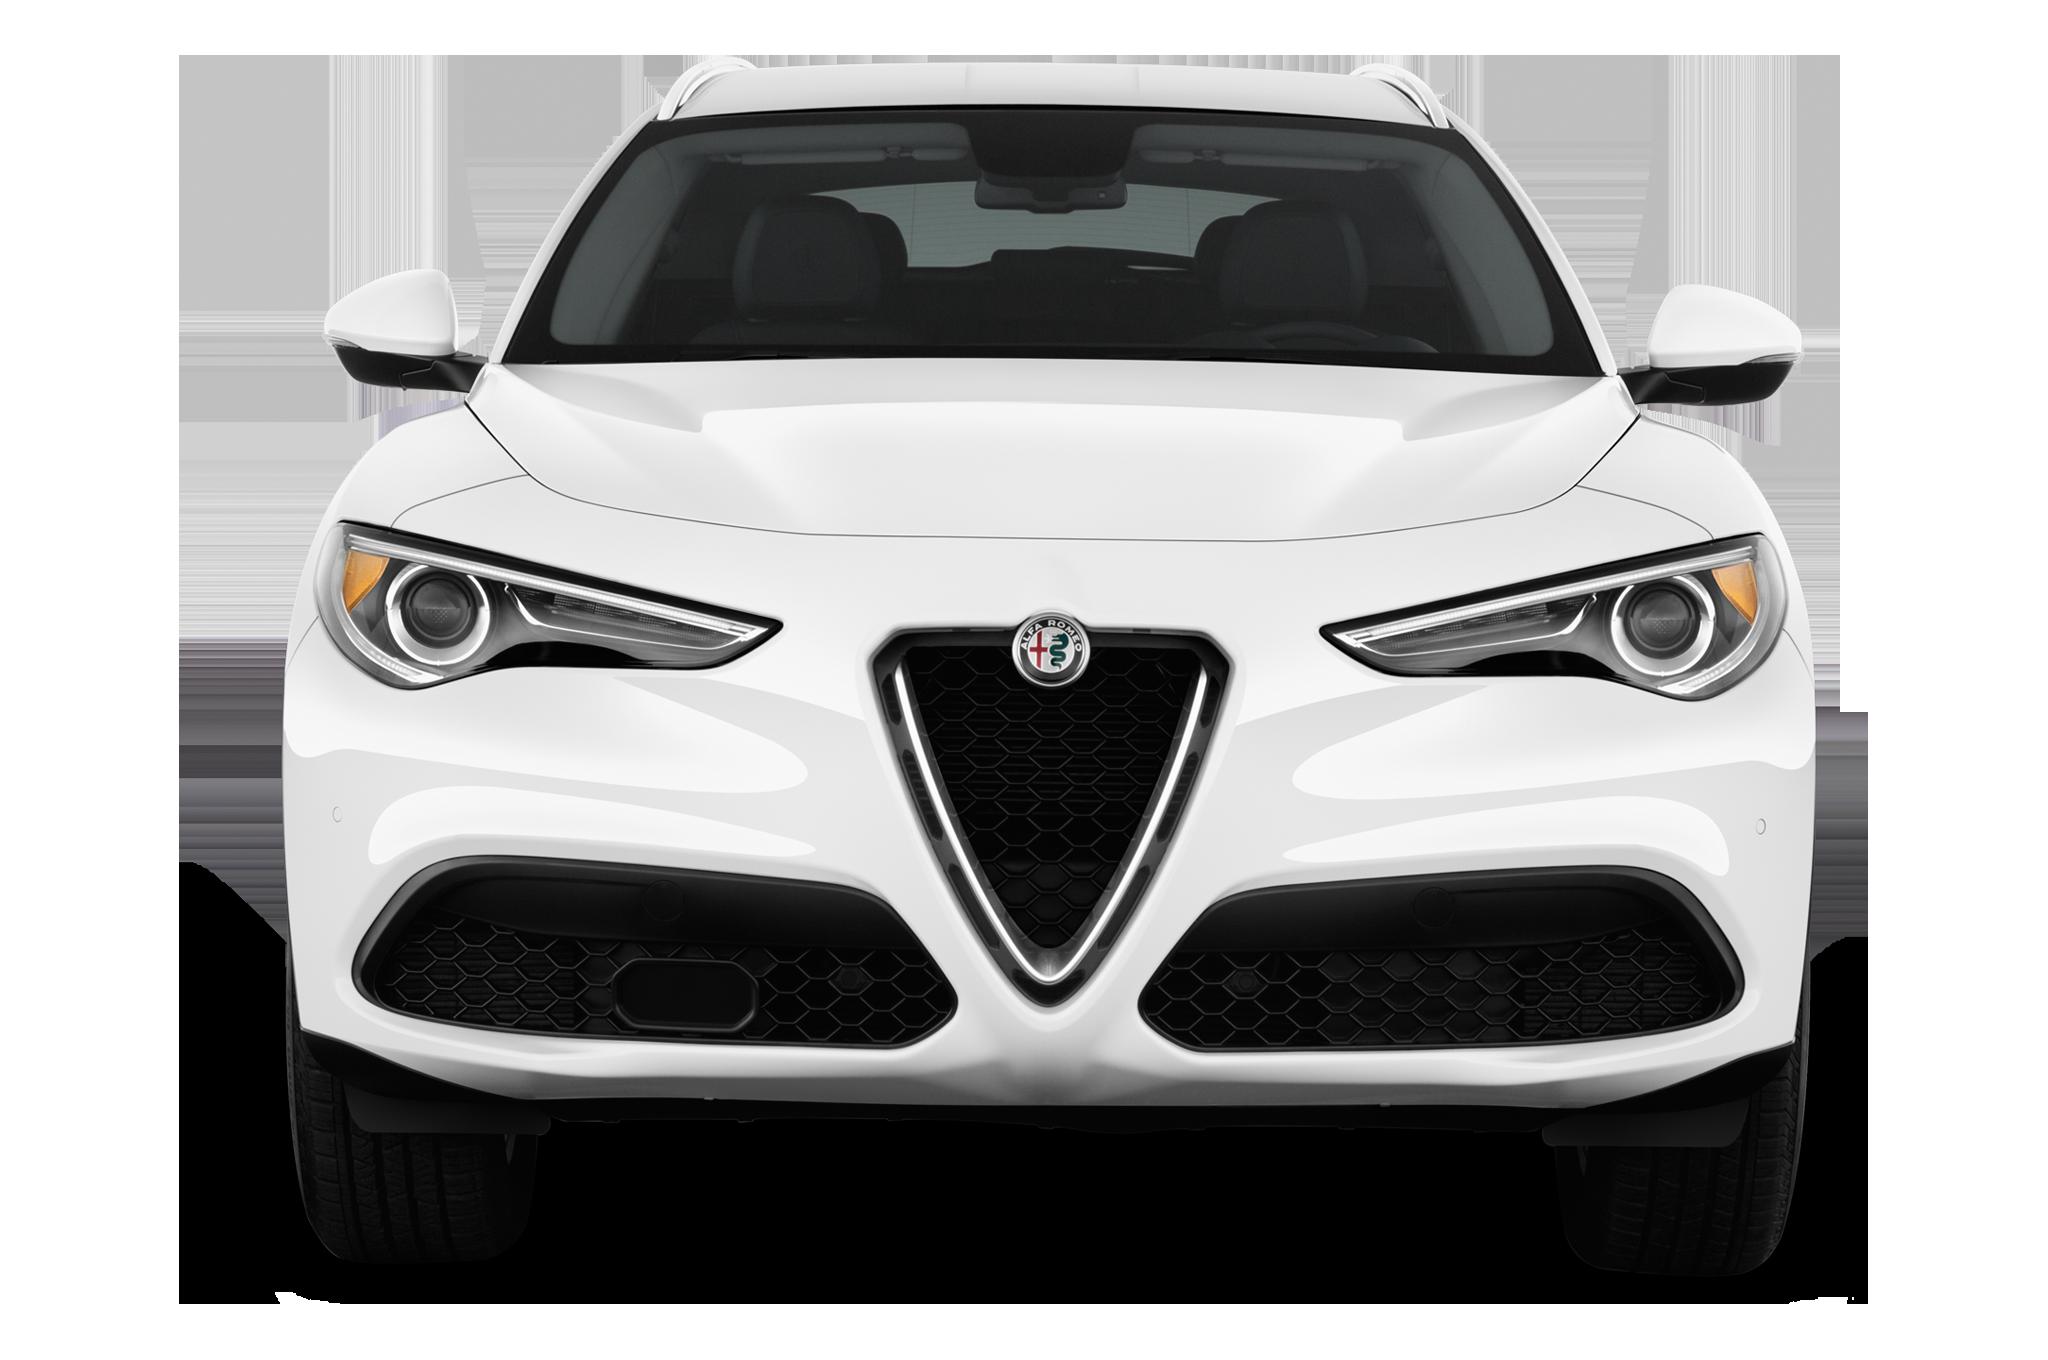 2018 Alfa Romeo Stelvio Q4 First Drive Review Msrp 9 25